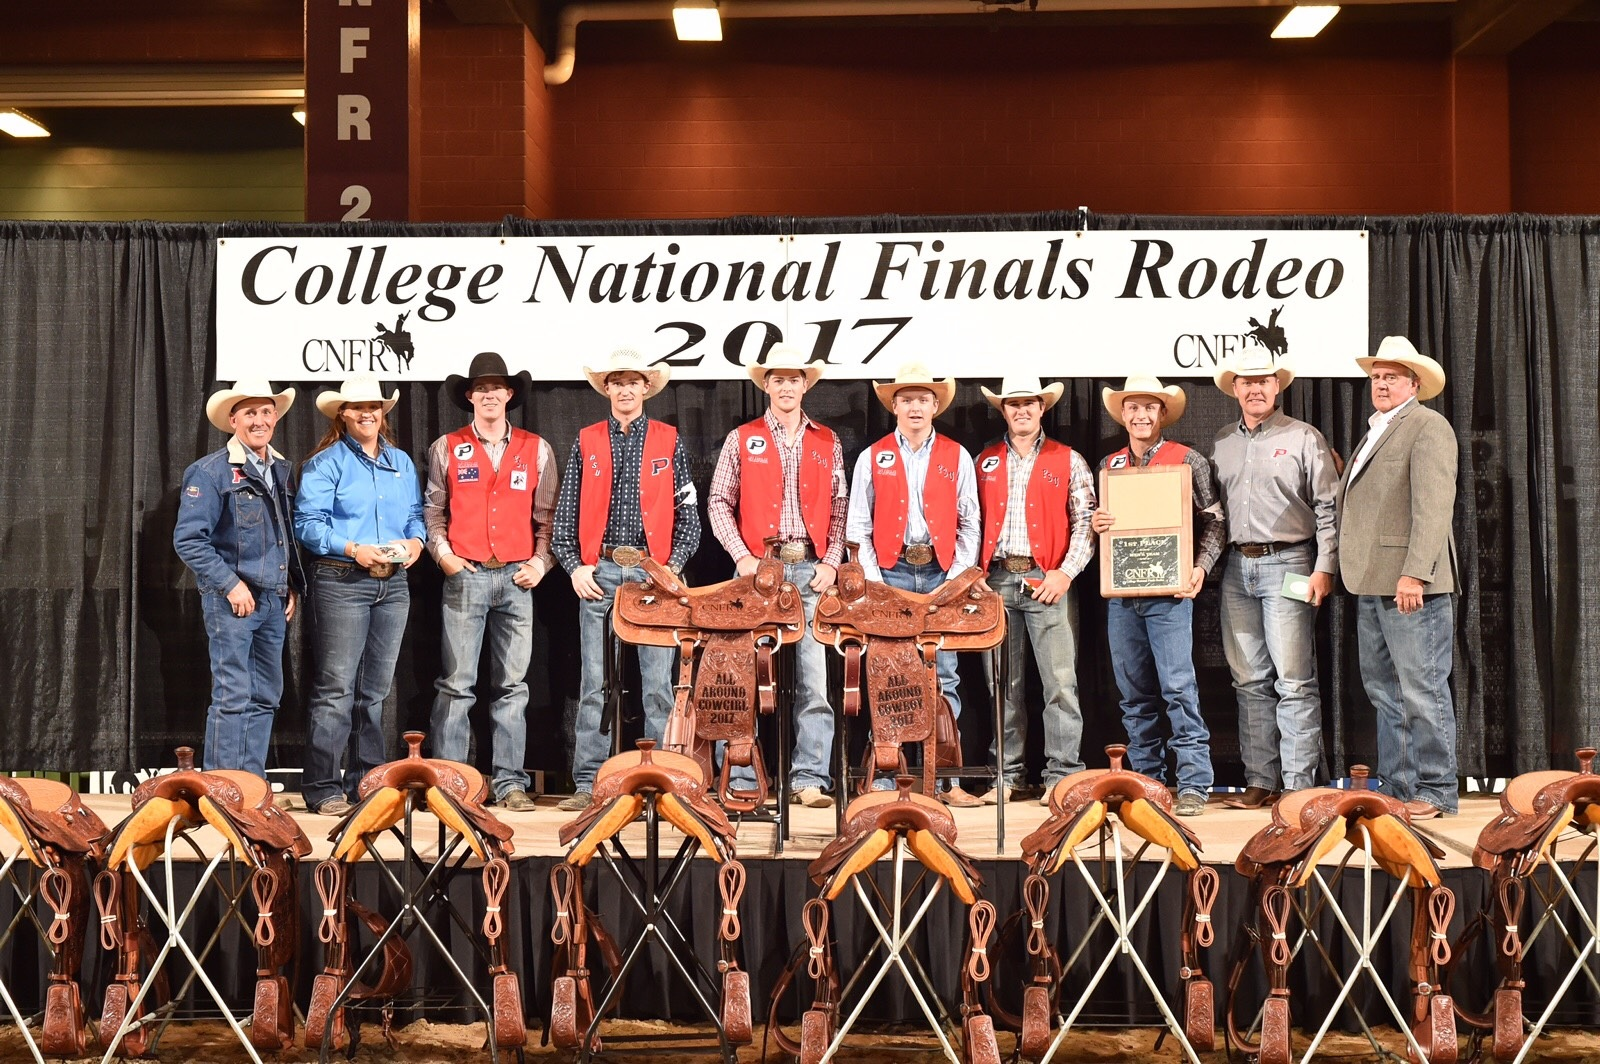 OPSU Men's Rodeo Team Wins National Title